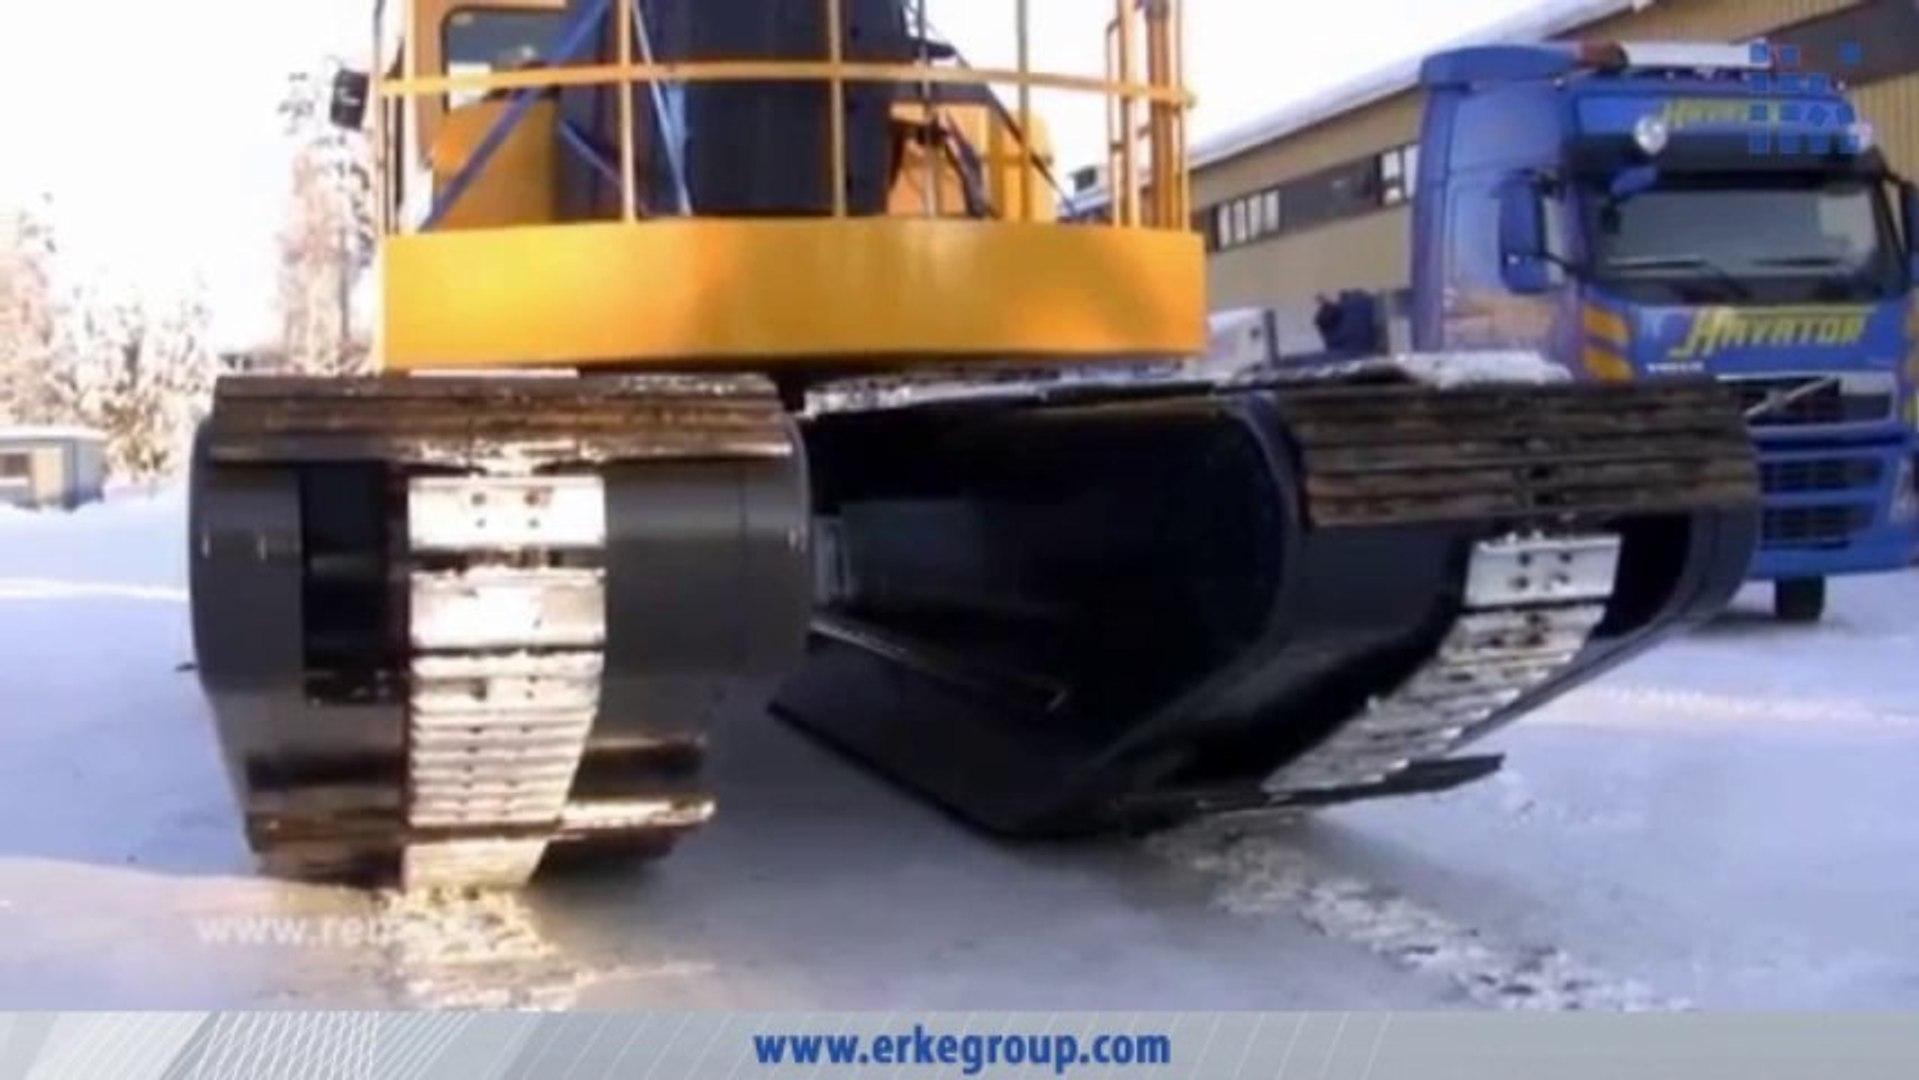 ERKE Dış Ticaret ltd., Big Float 12.24 Amphibious Excavator - Loading - www.erkegroup.com